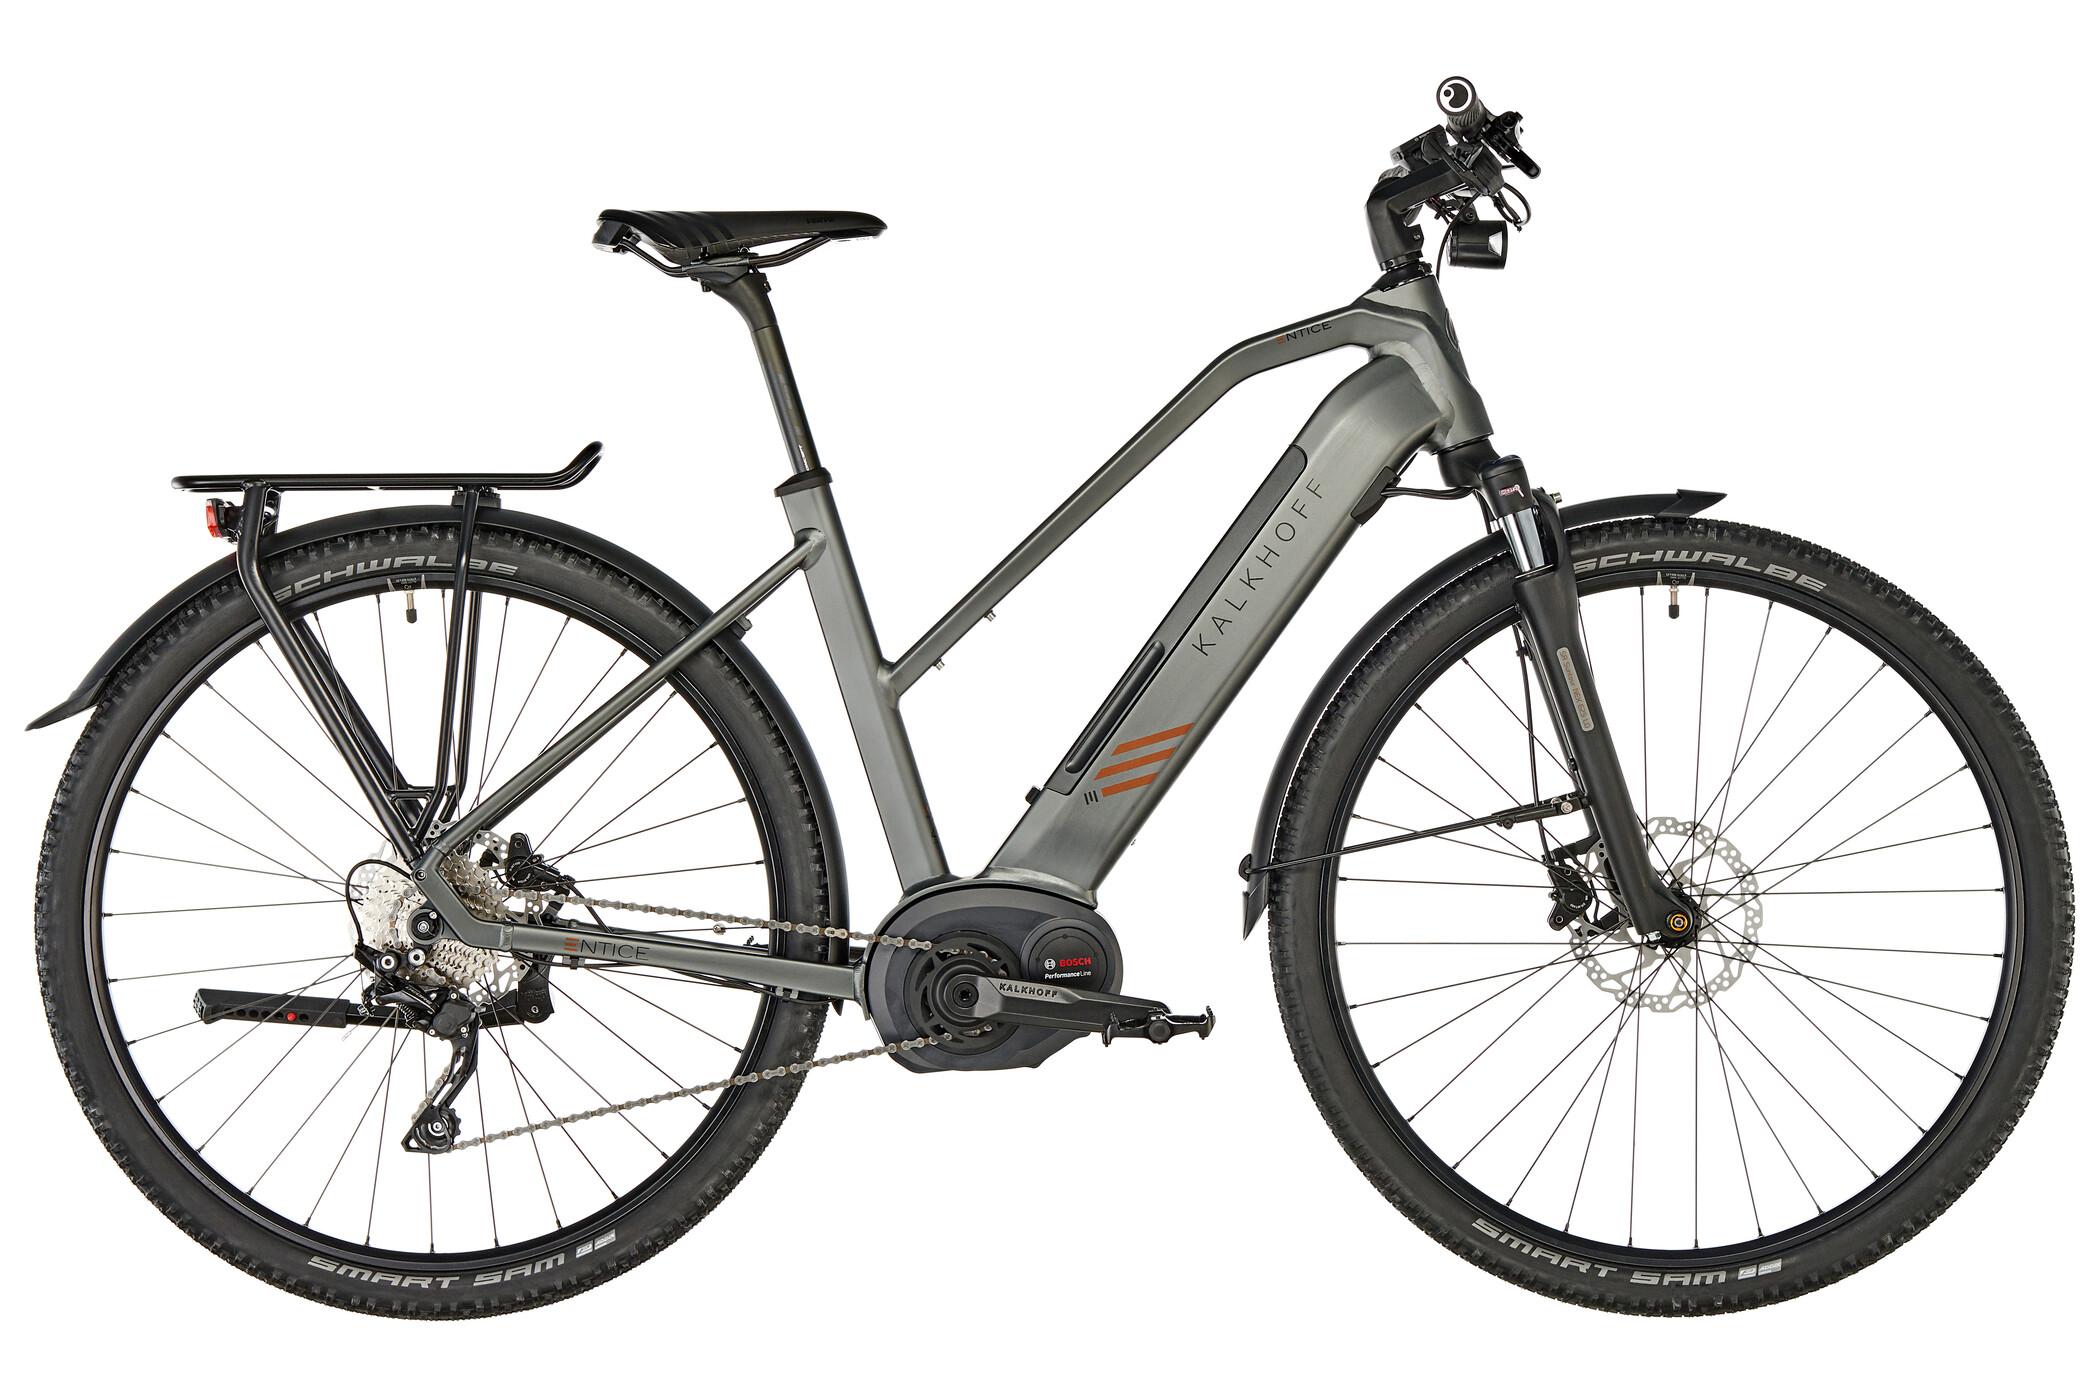 Kalkhoff Entice 5.B Tour E-trekkingcykel Trapez 500Wh grå (2019) | City-cykler